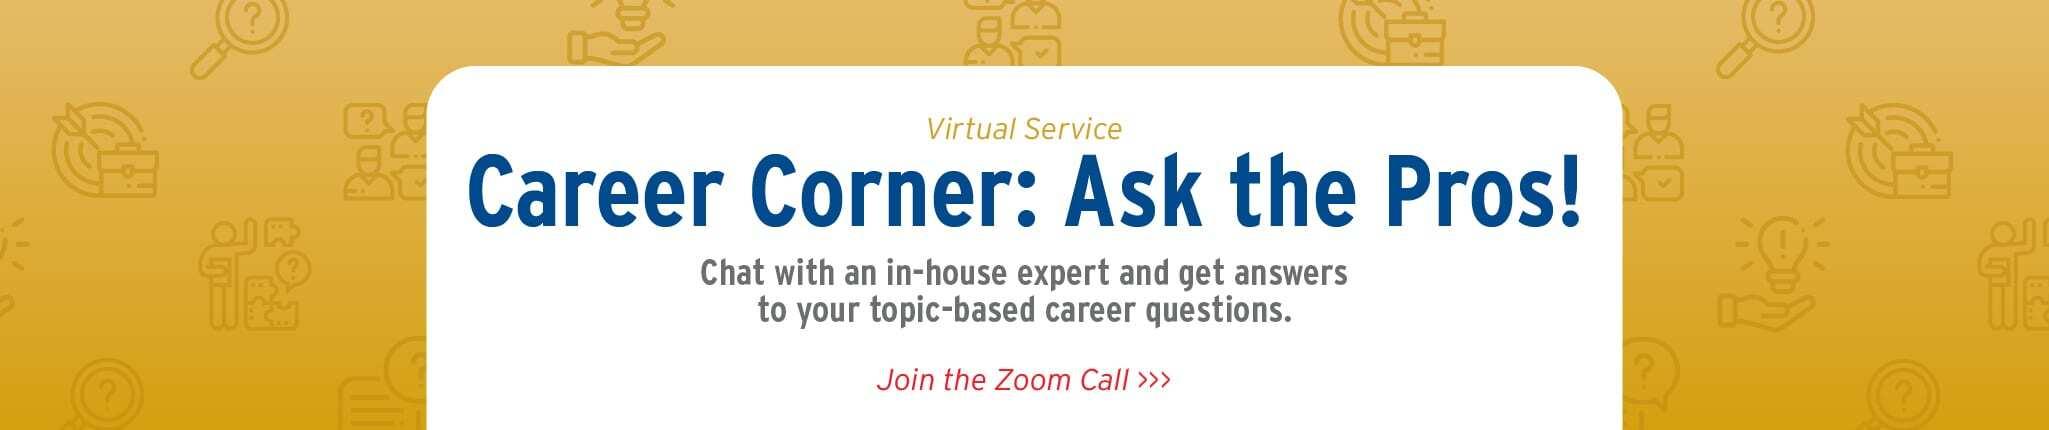 Virtual Career Corner Ask the Pros